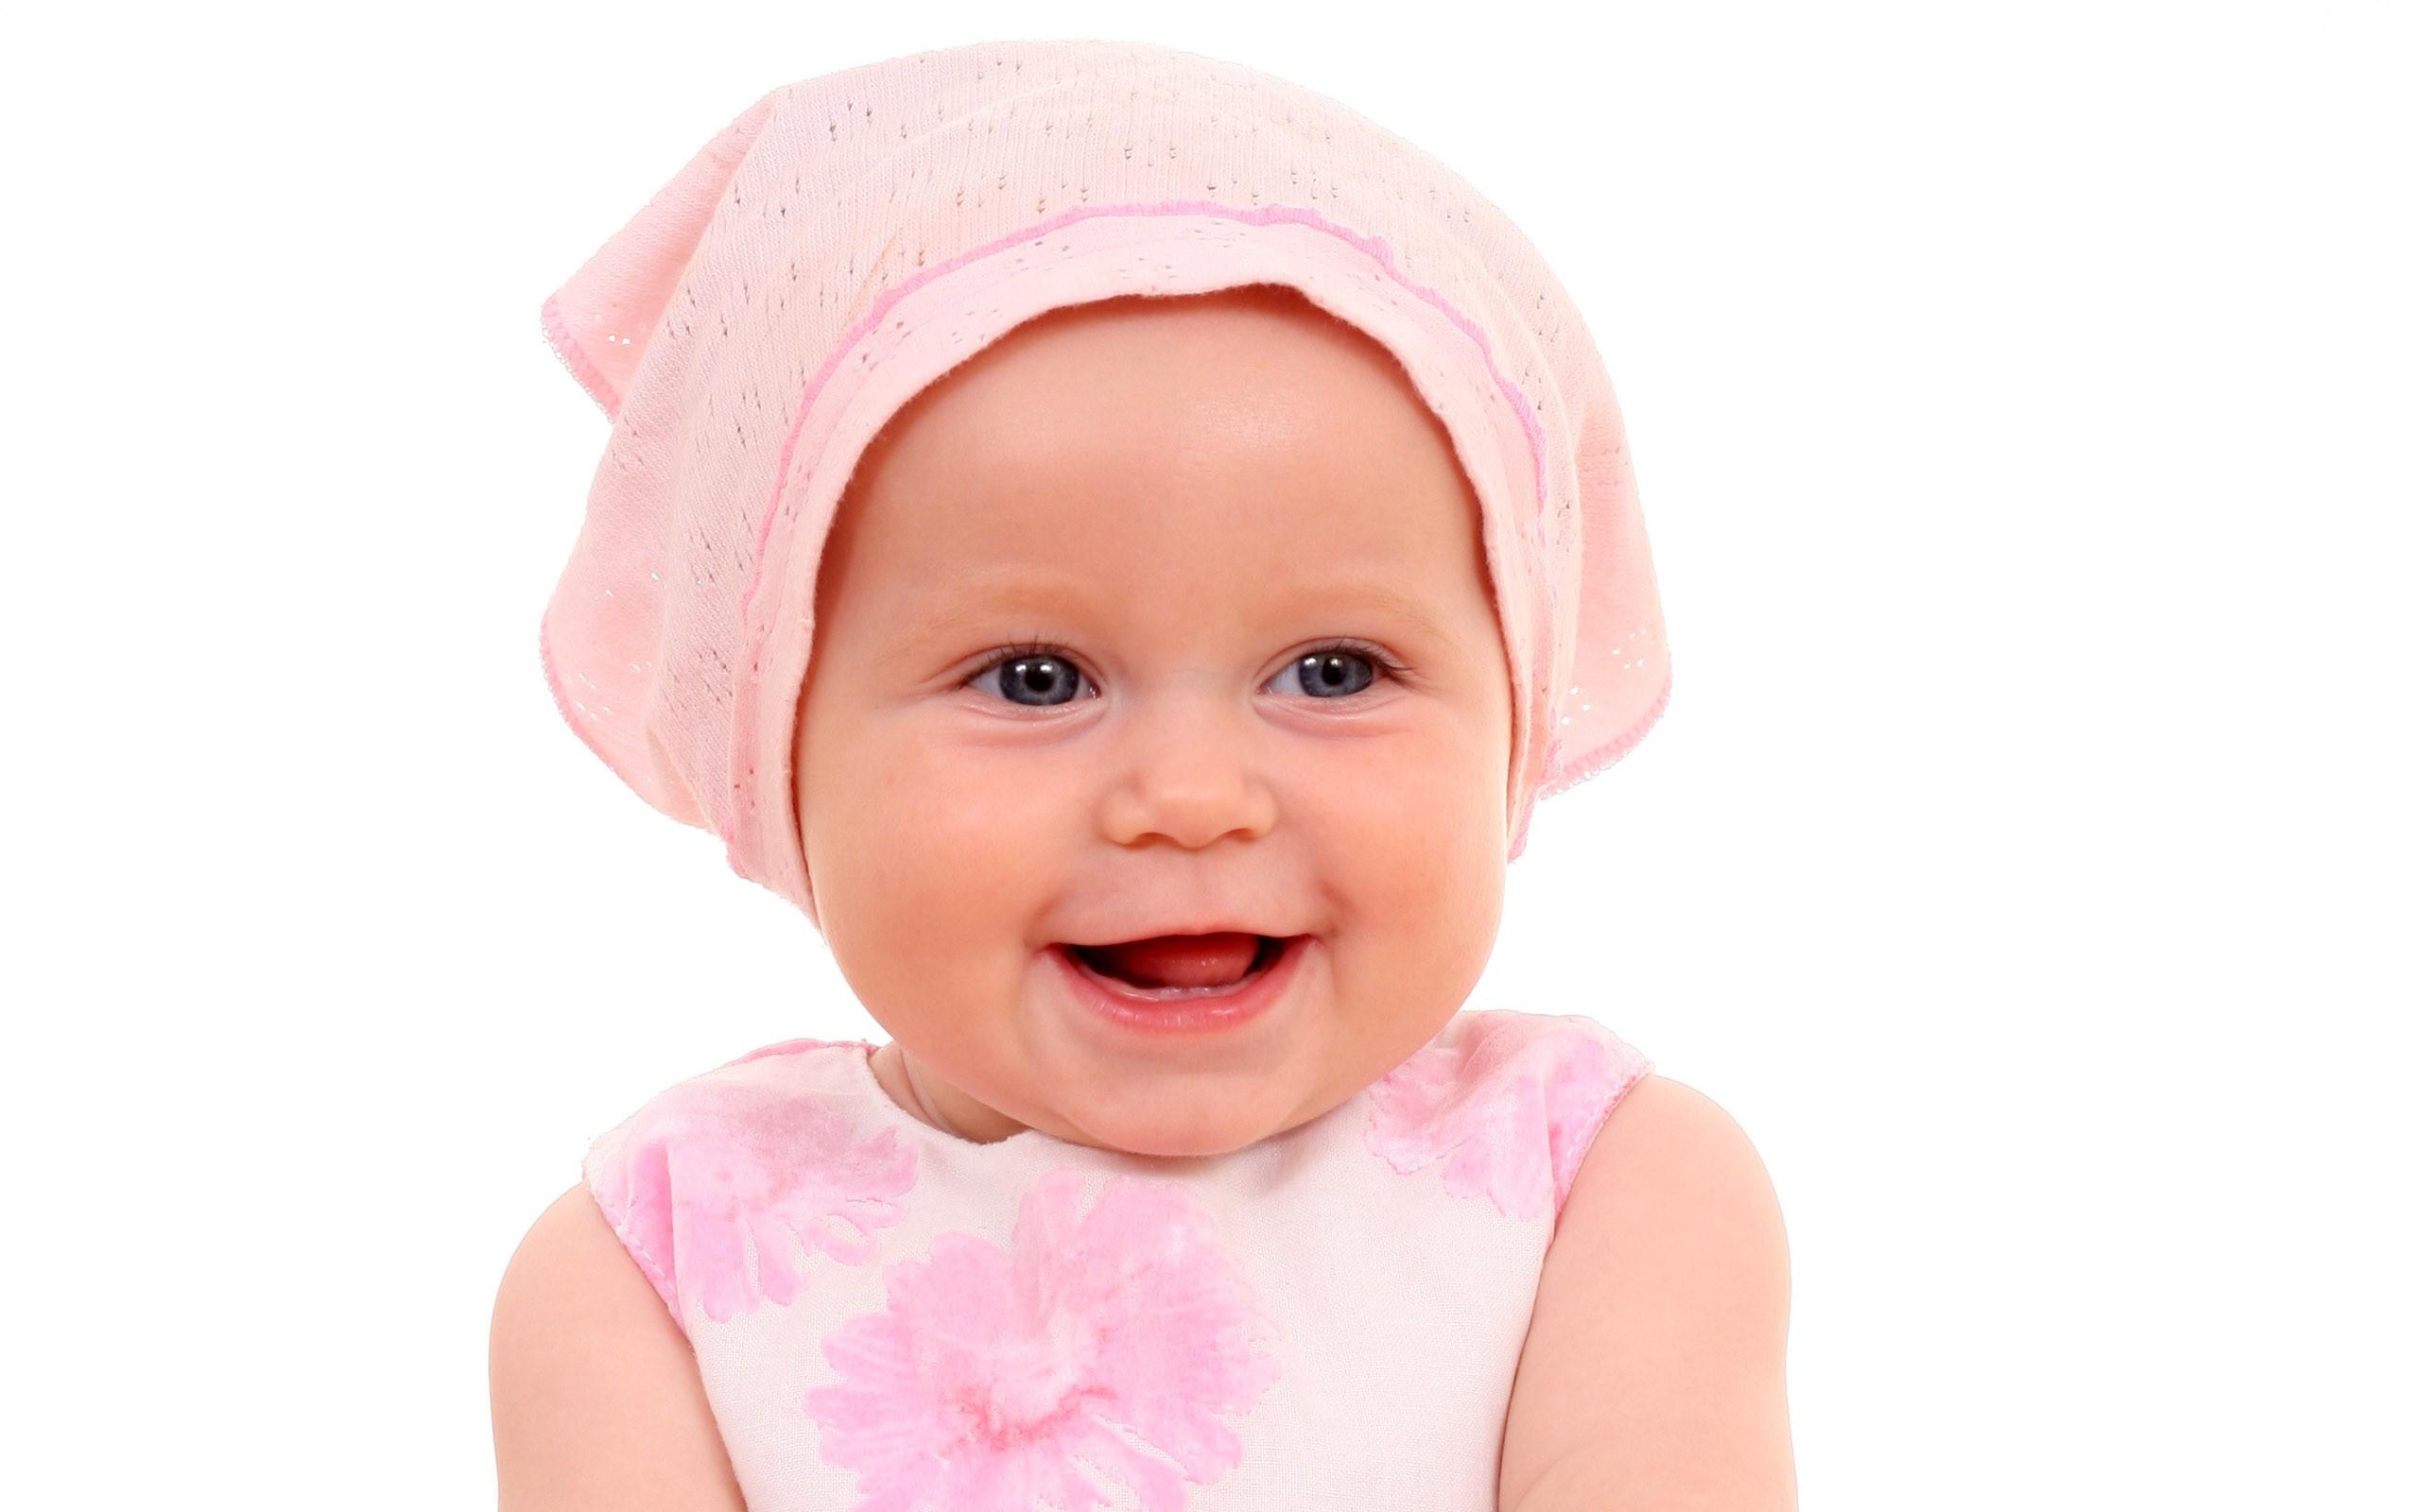 bebek 10 k hd resmi